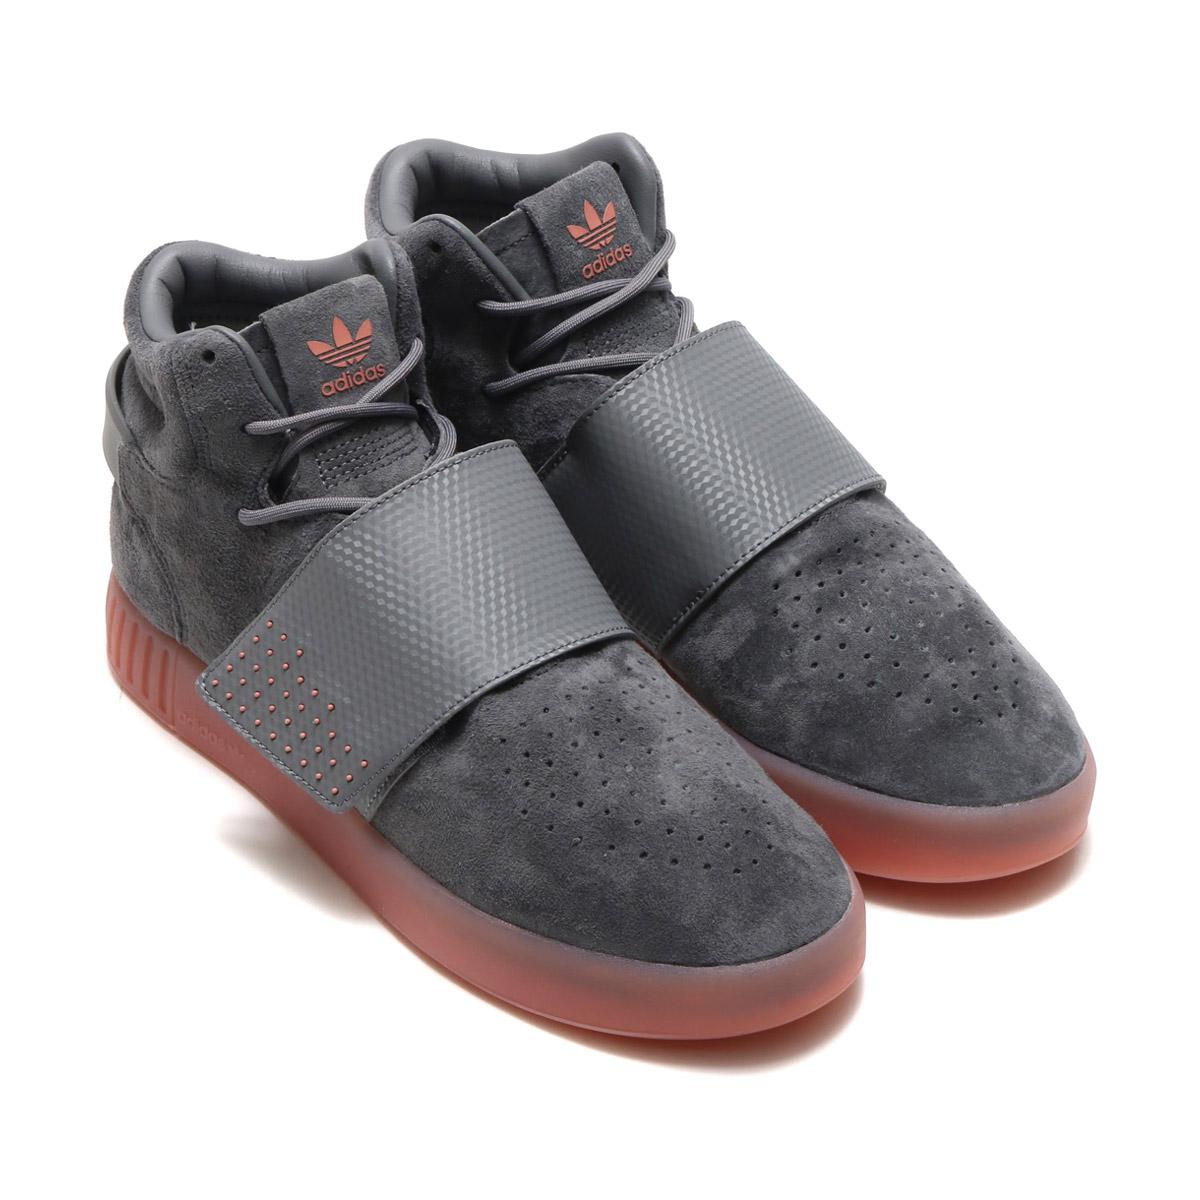 new concept aa49d d2bfa adidas Originals TUBULAR INVADER STRAP (アディダスオリジナルスチューブラーインベーダーストラップ) Grey  Four/Grey Four/Raw Pink 17FW-I